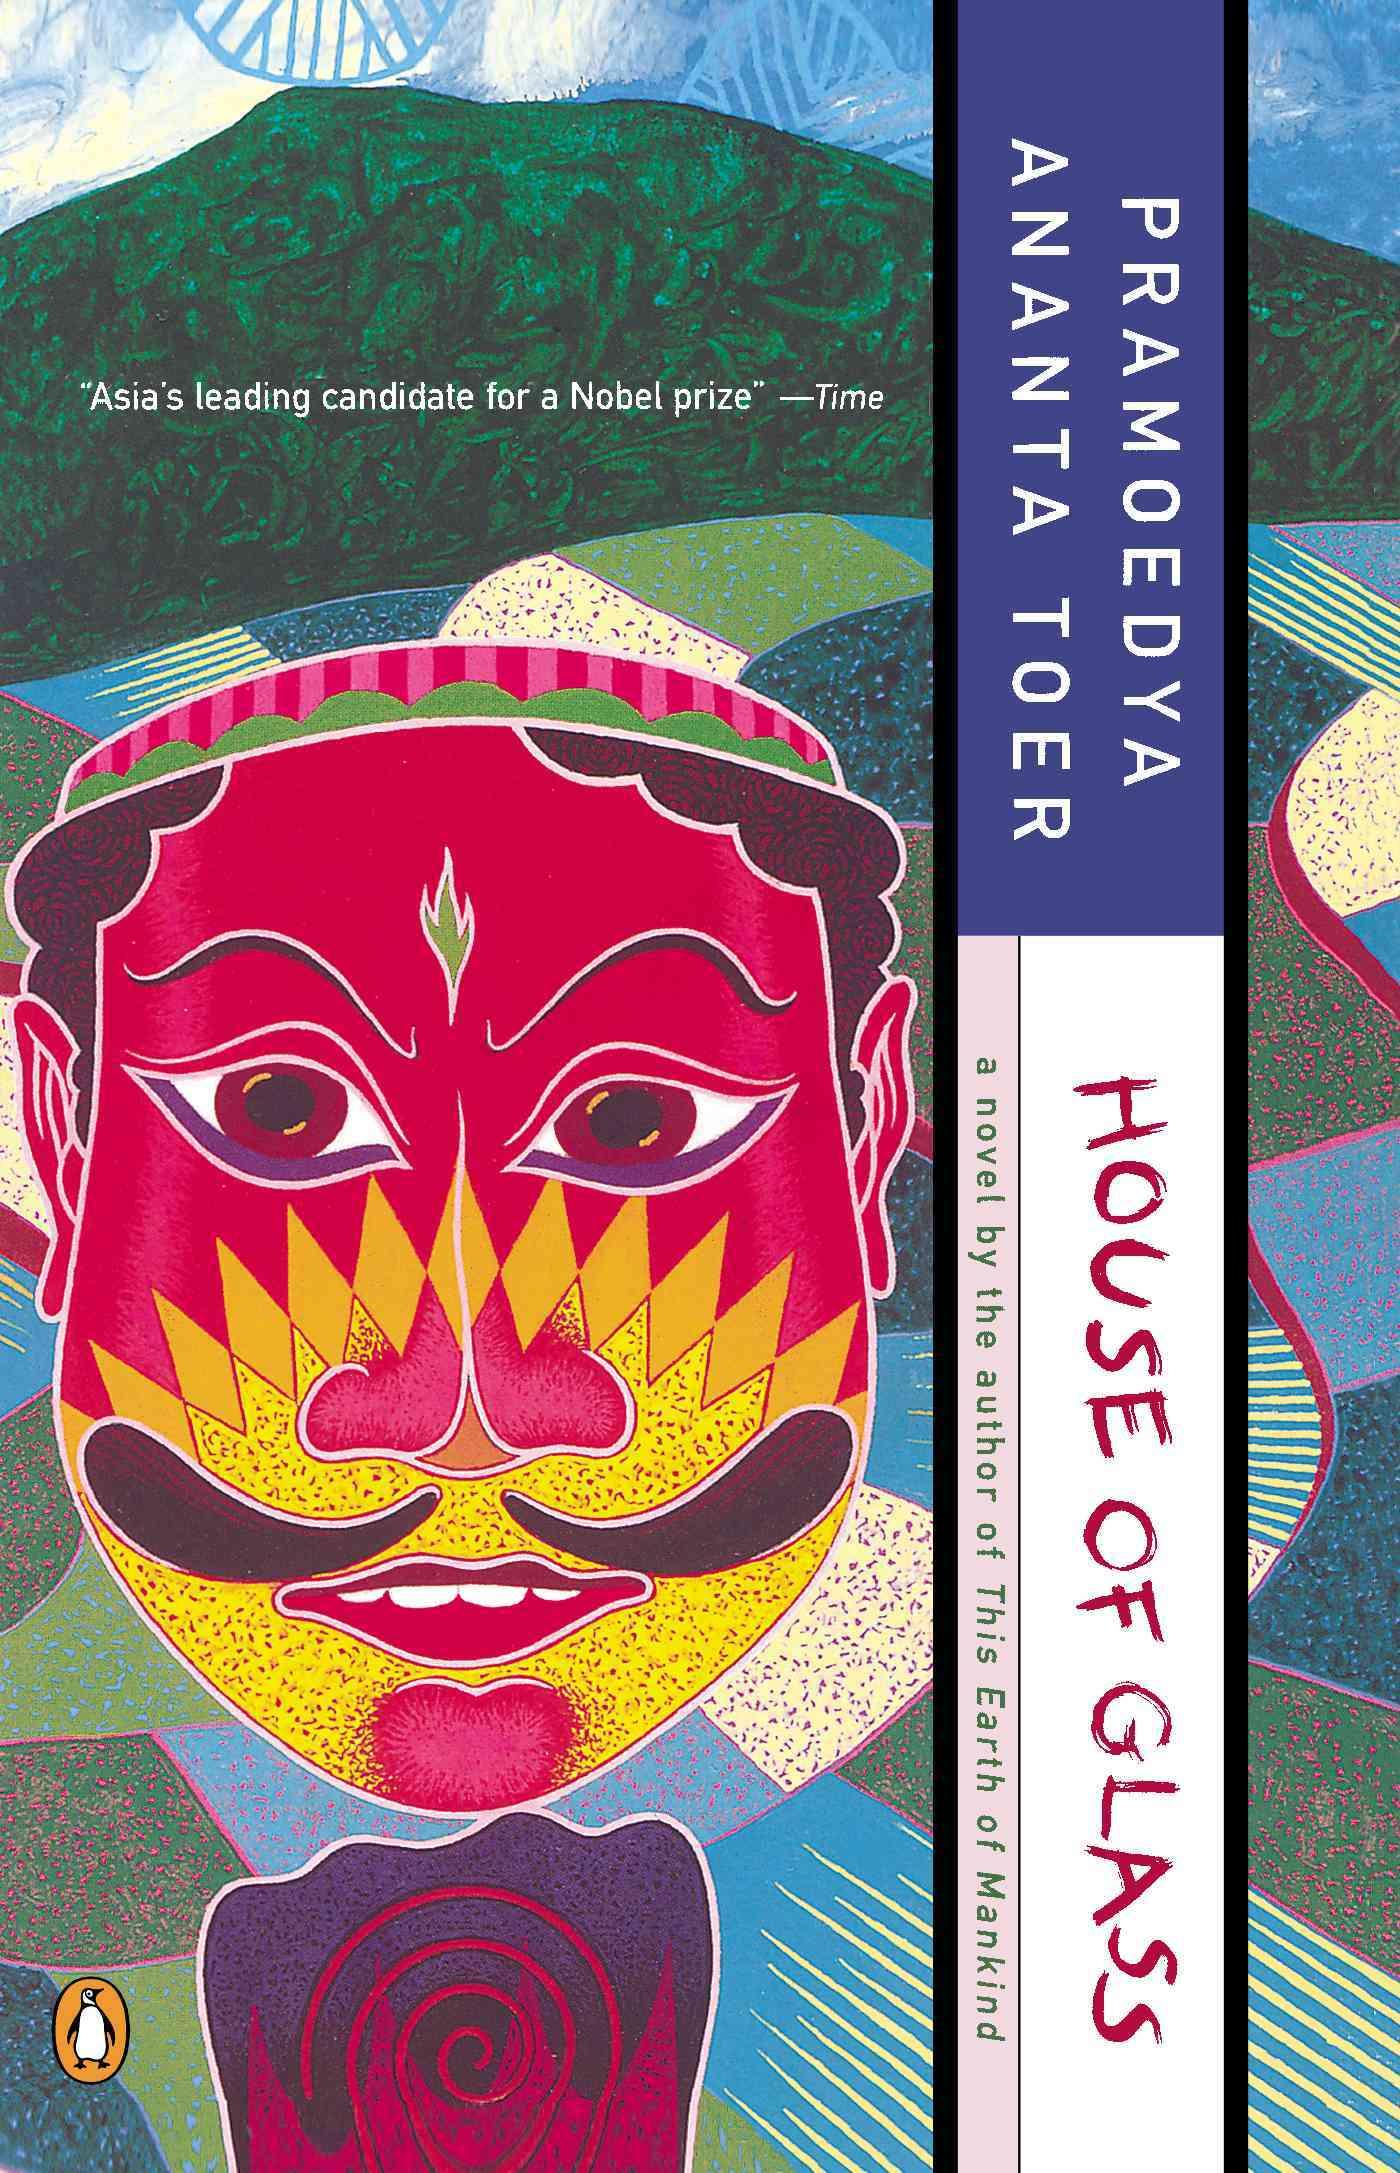 House of Glass By Toer, Pramoedya Ananta/ Lane, Max (TRN)